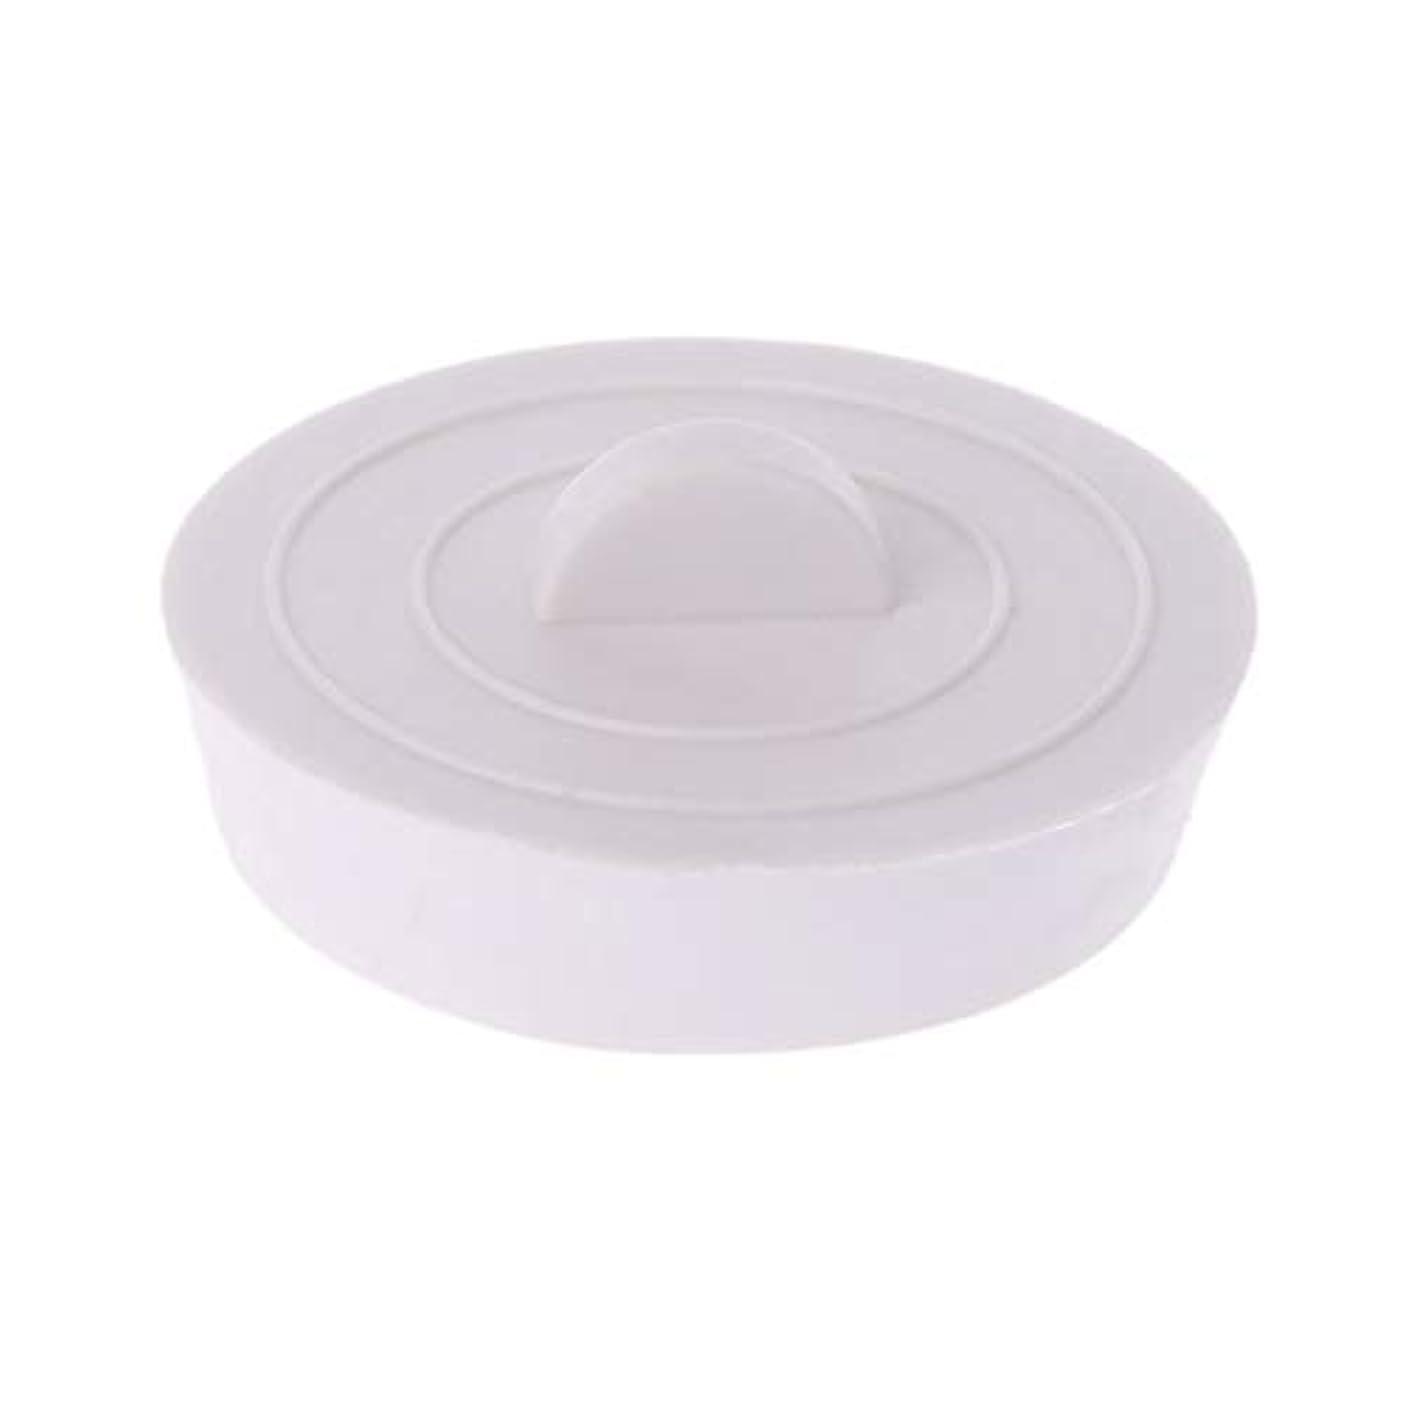 Lamdooシリコン浴槽シンク洗面台プラグストッパー排水ストップホームキッチンバスルーム